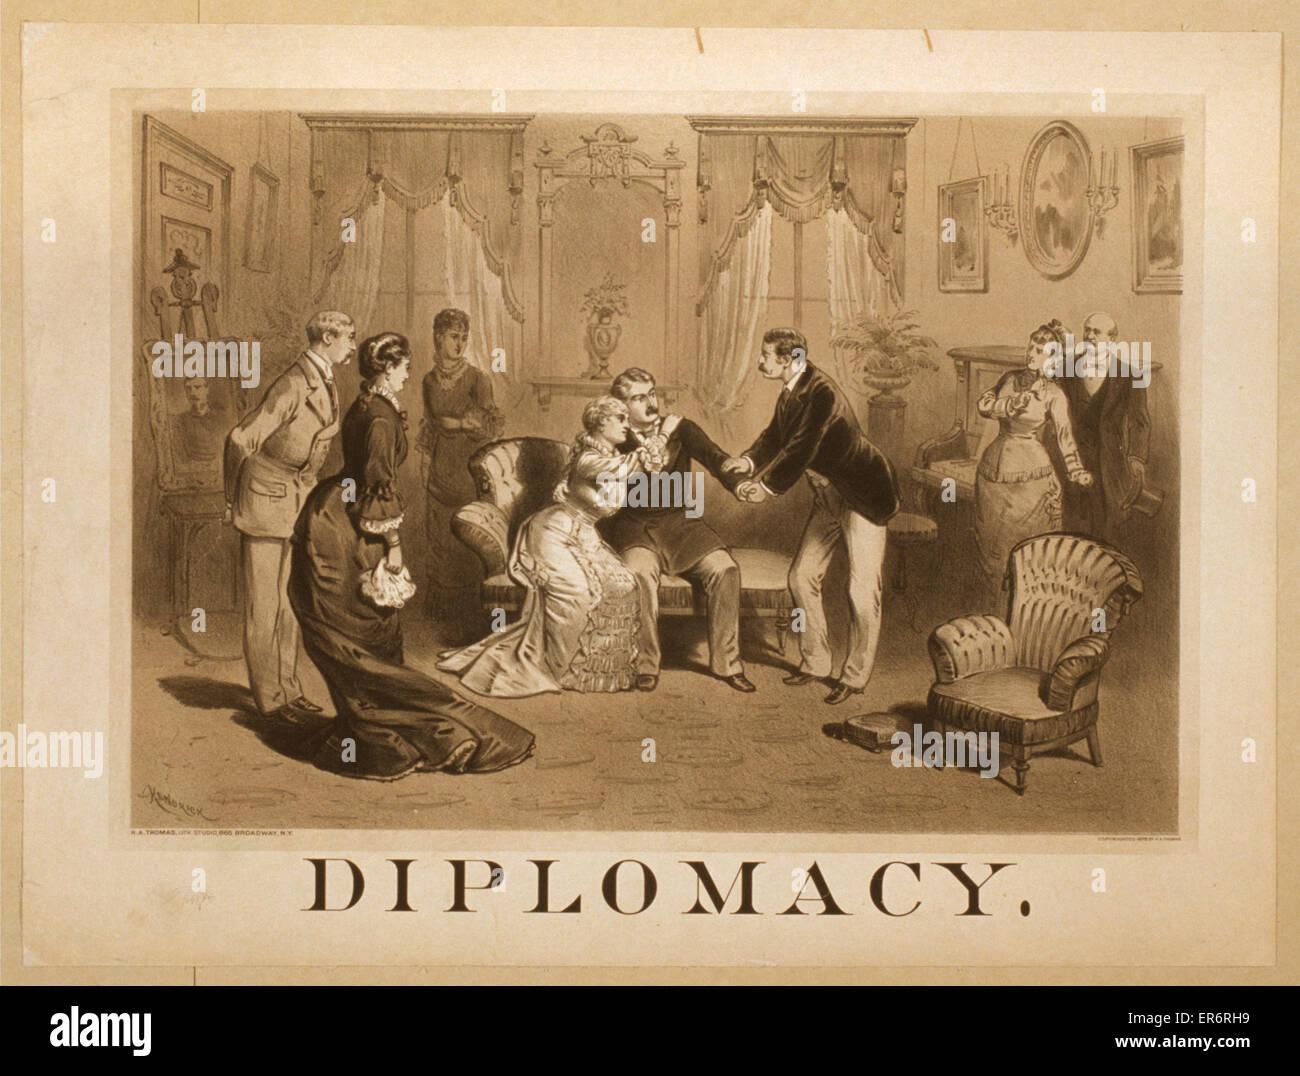 Diplomacy. Date c1878. - Stock Image